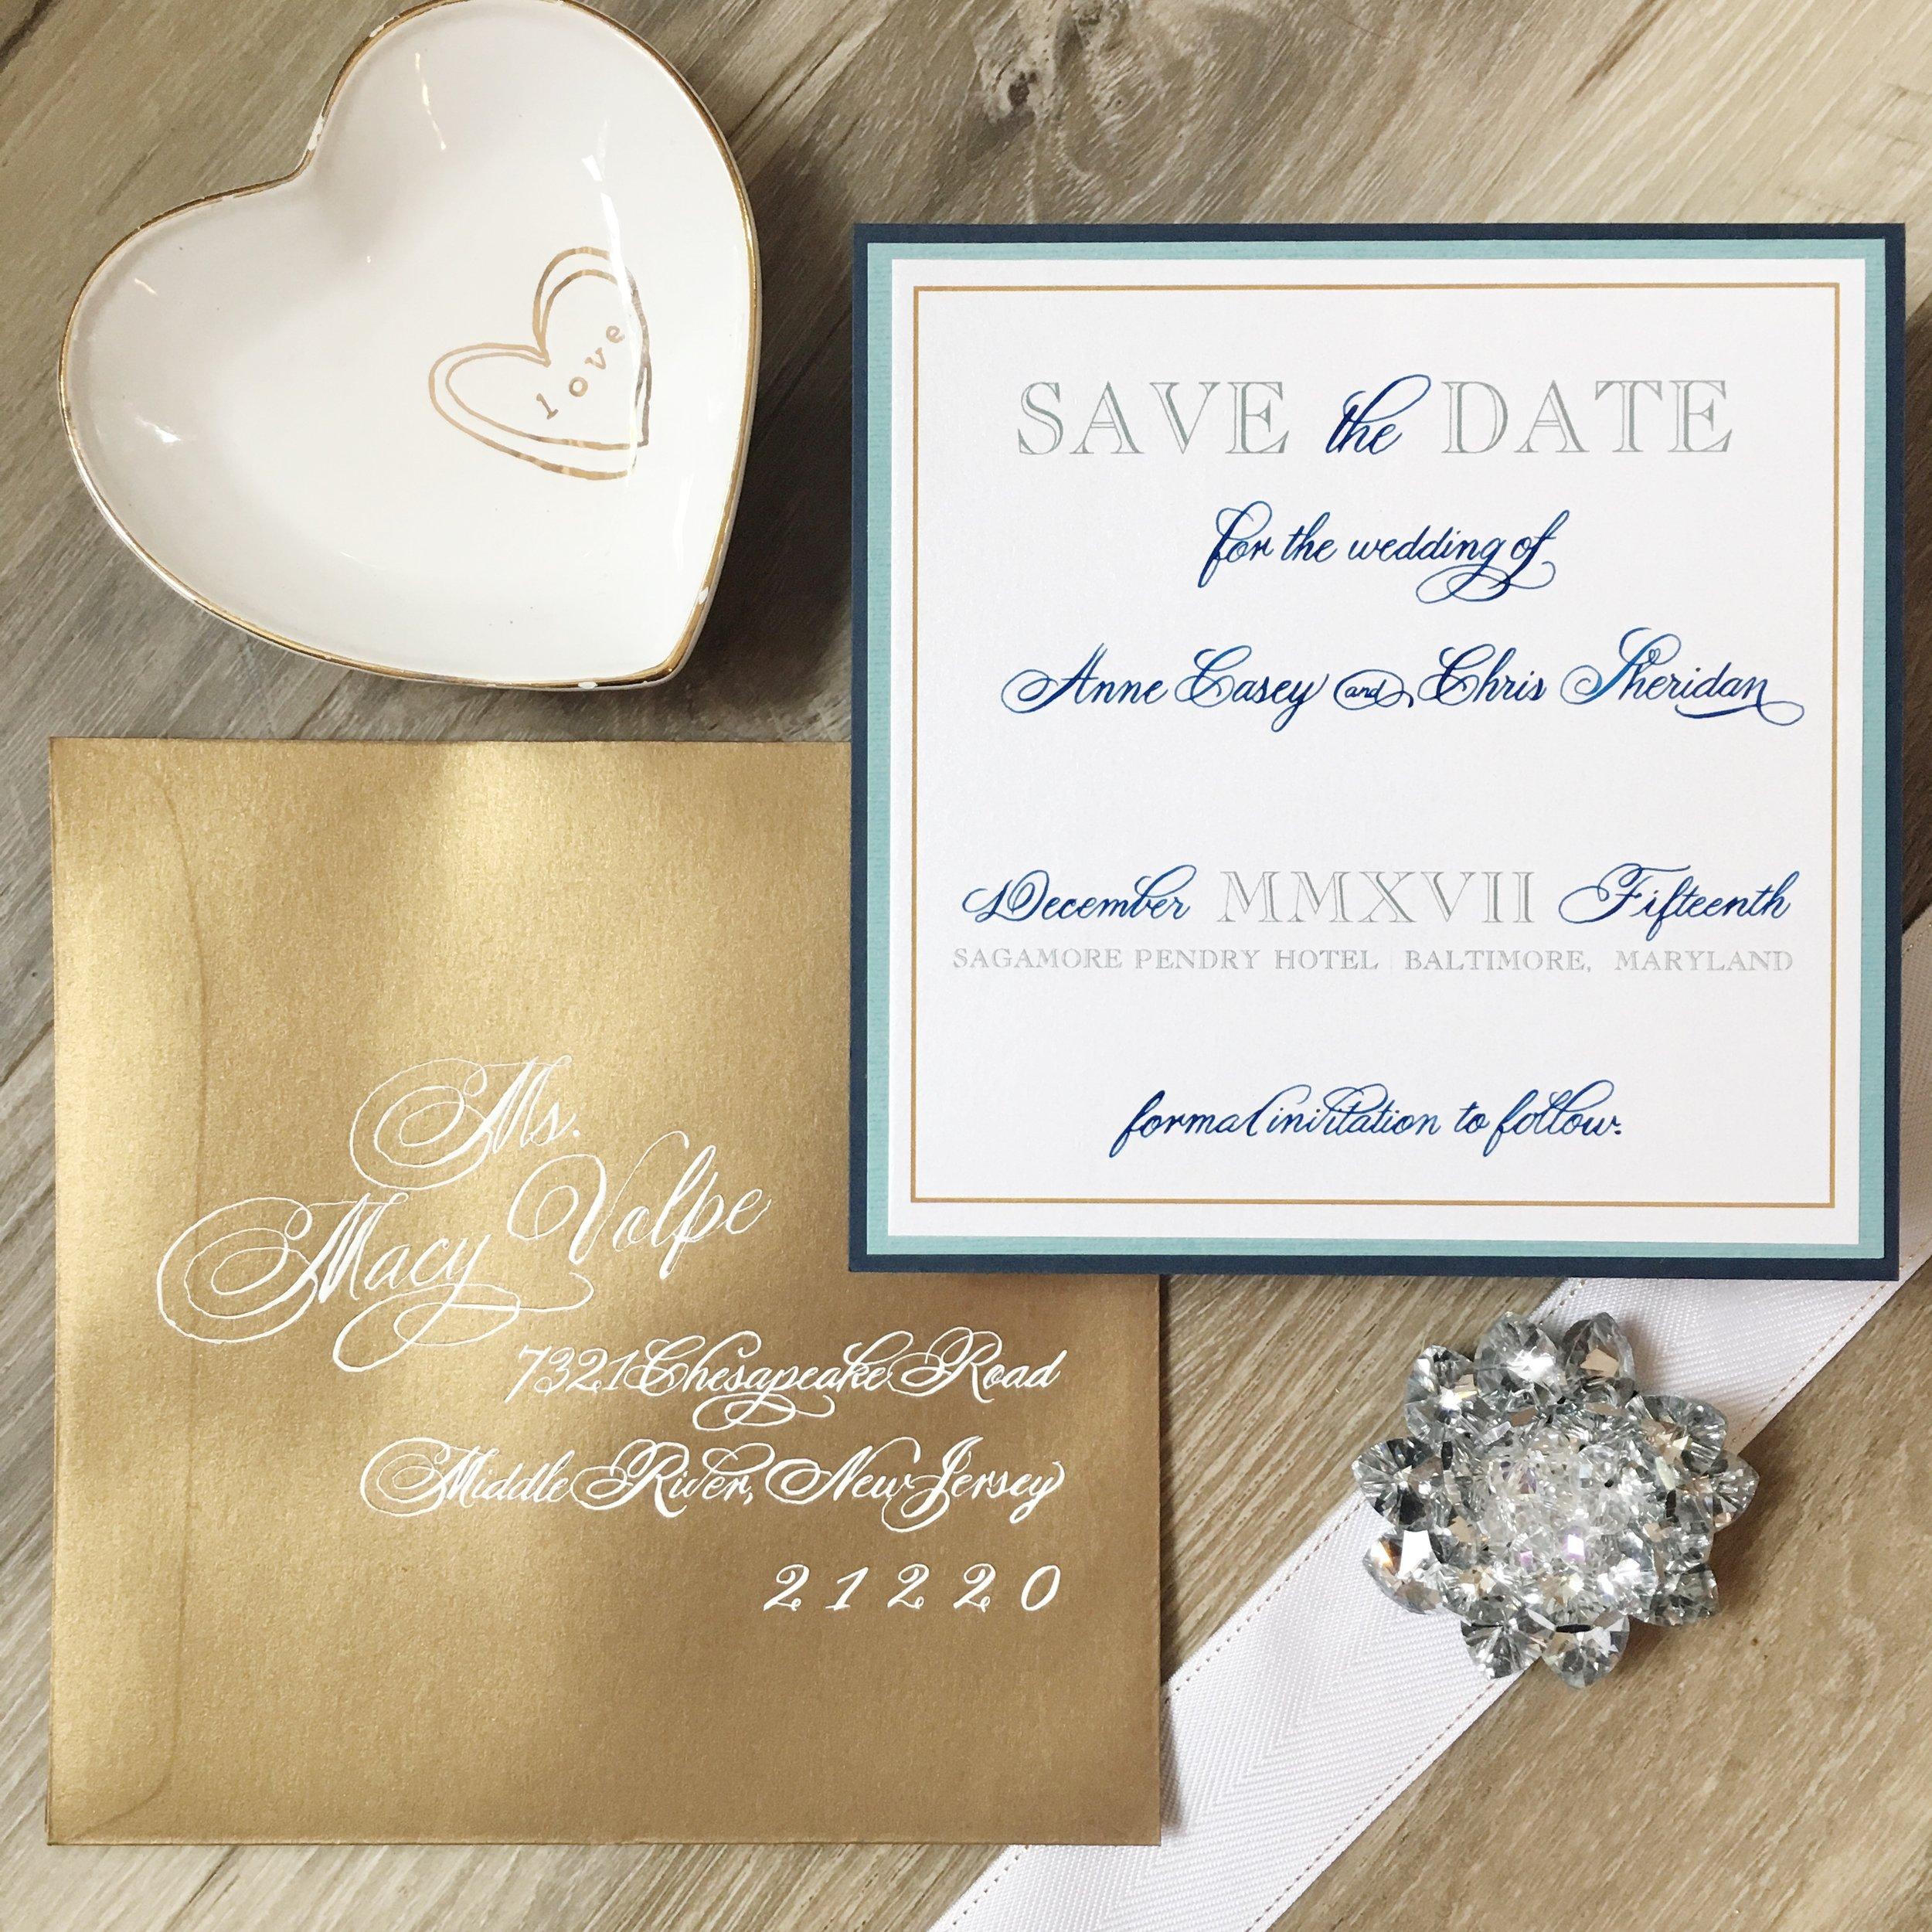 Central PA, York PA, JesSmith Designs, custom, wedding, invitations, bridal, announcements, save the date, baby, hanover, calligraphy, baltimore, wedding invitations, lancaster, gettysburg-06-20 17.18.36.jpg